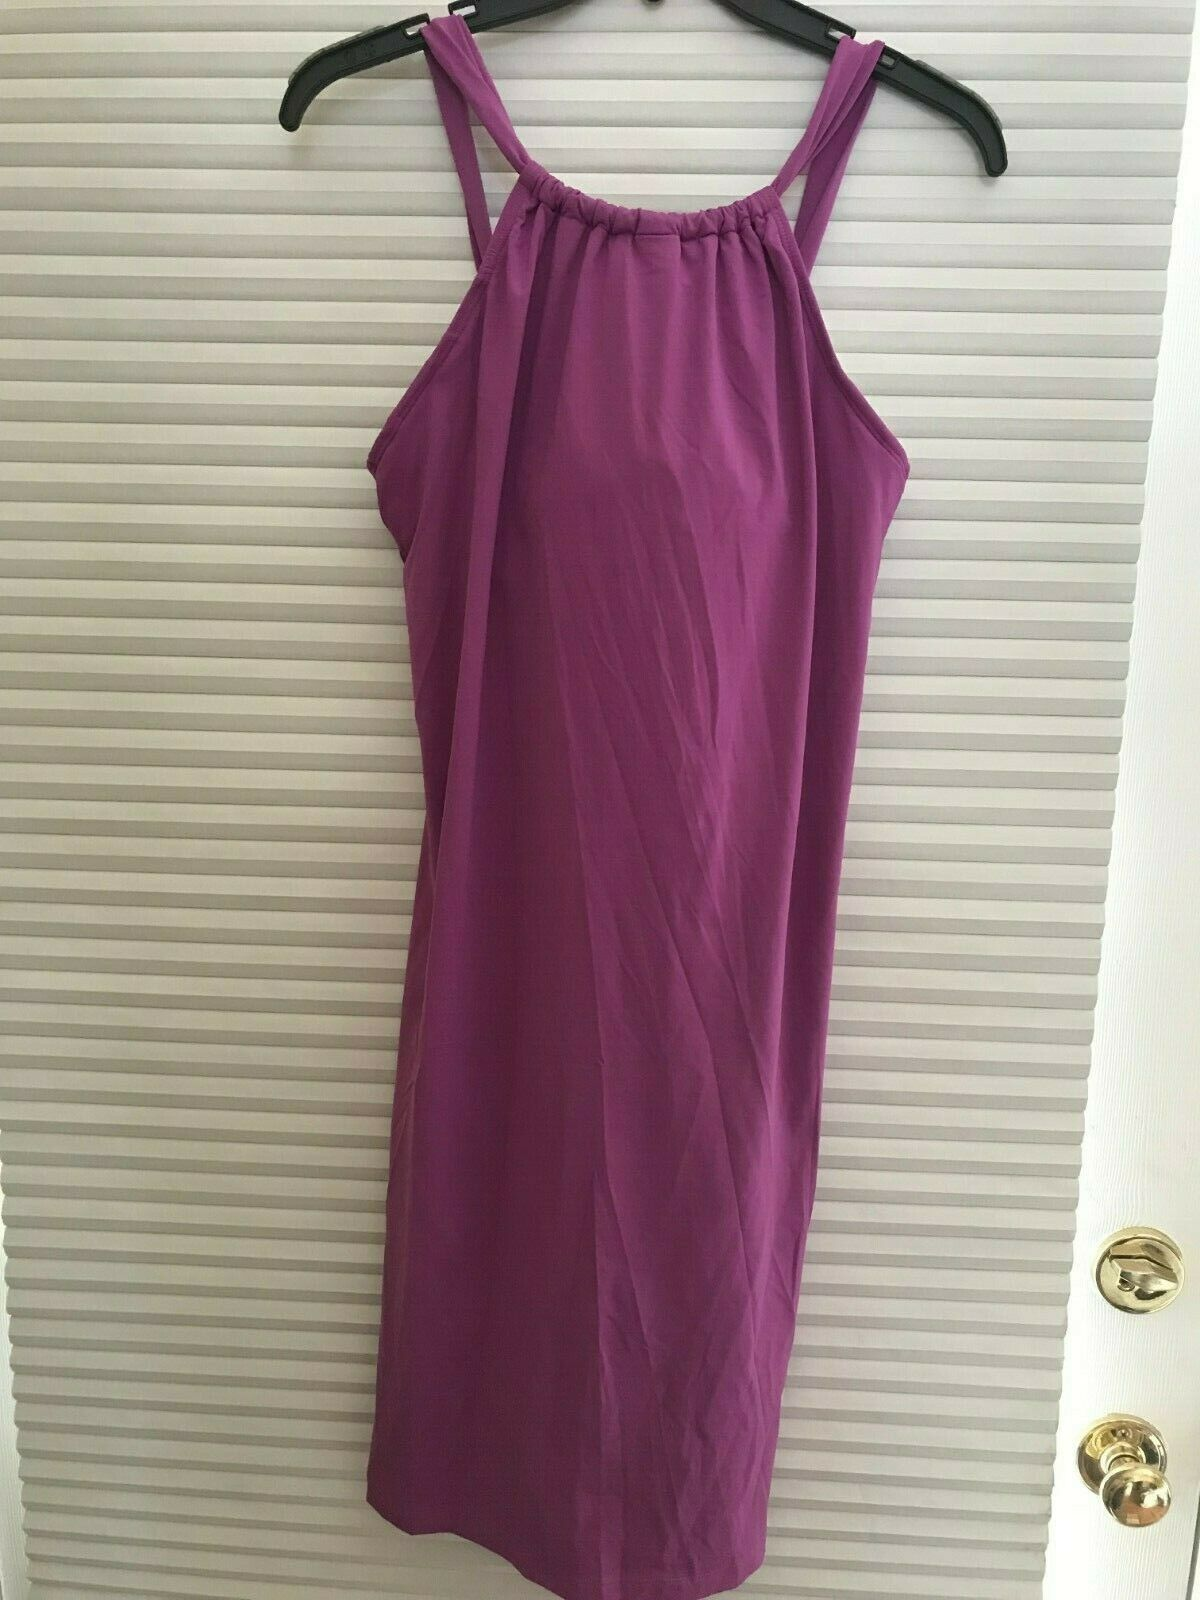 NWOT Athleta Kokomo Dress, Purple SIZE M                         N0221